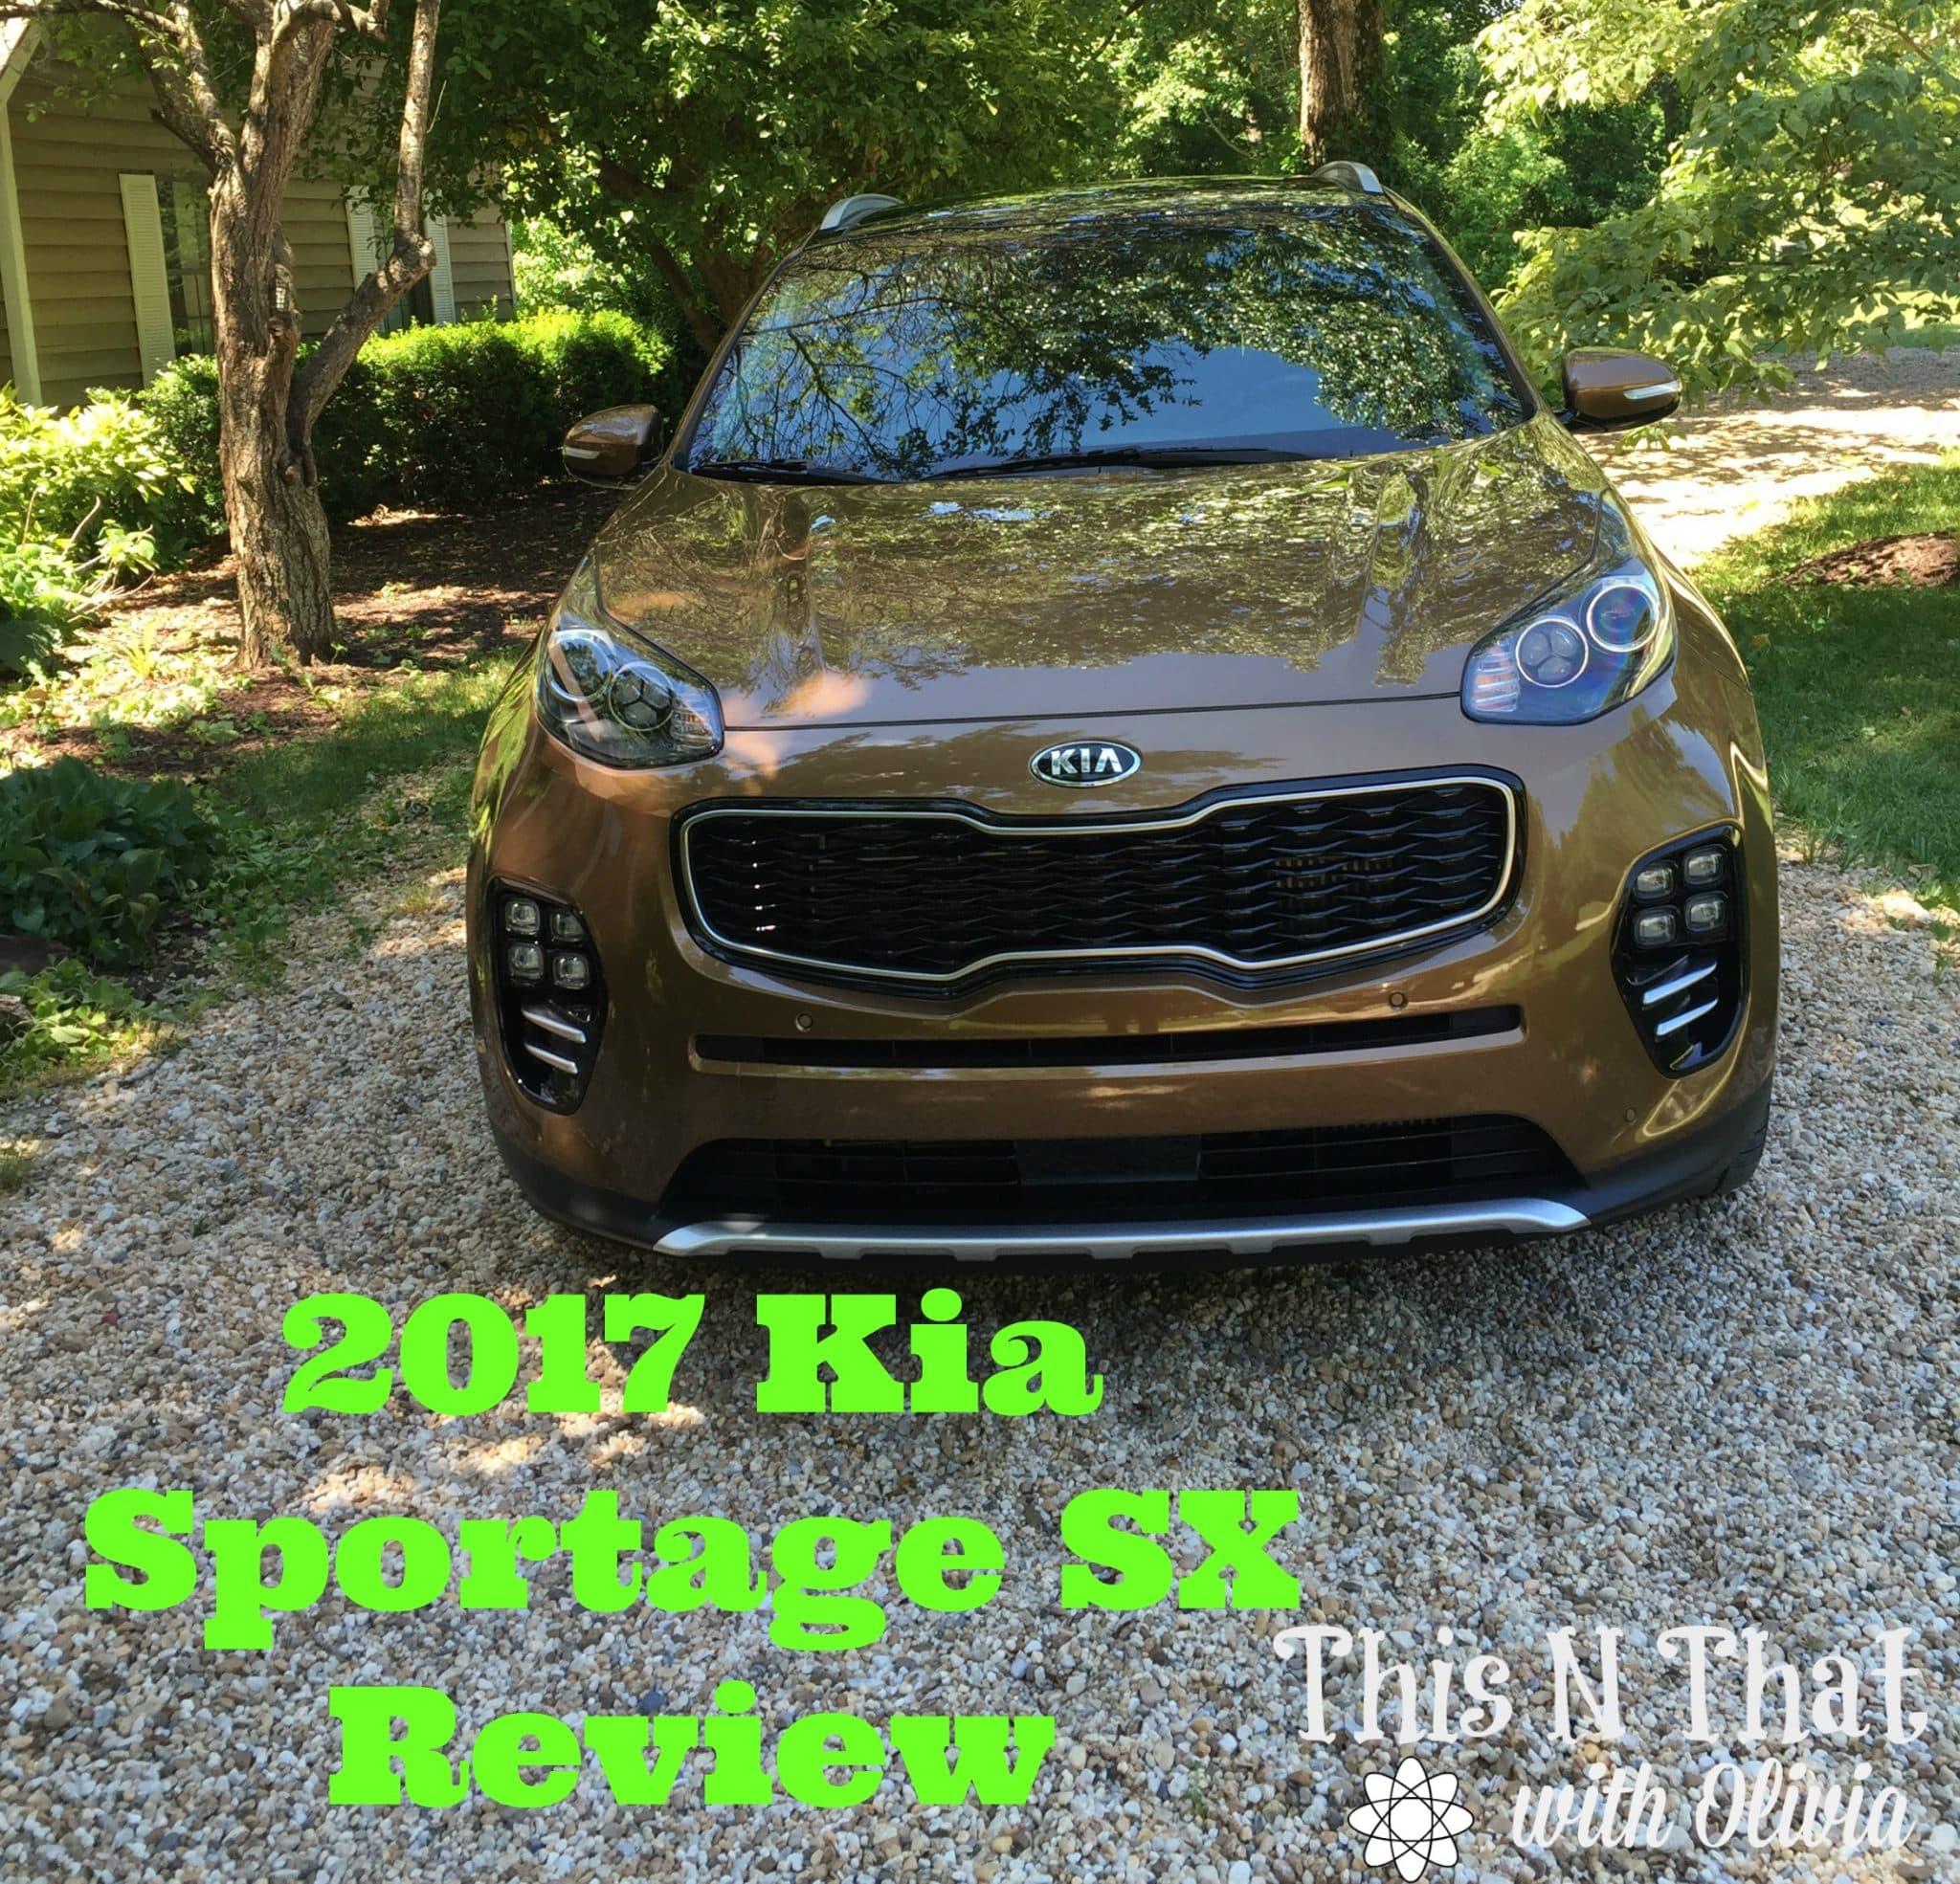 2017 Kia Sportage SX Review #DriveKia @Kia_Motors